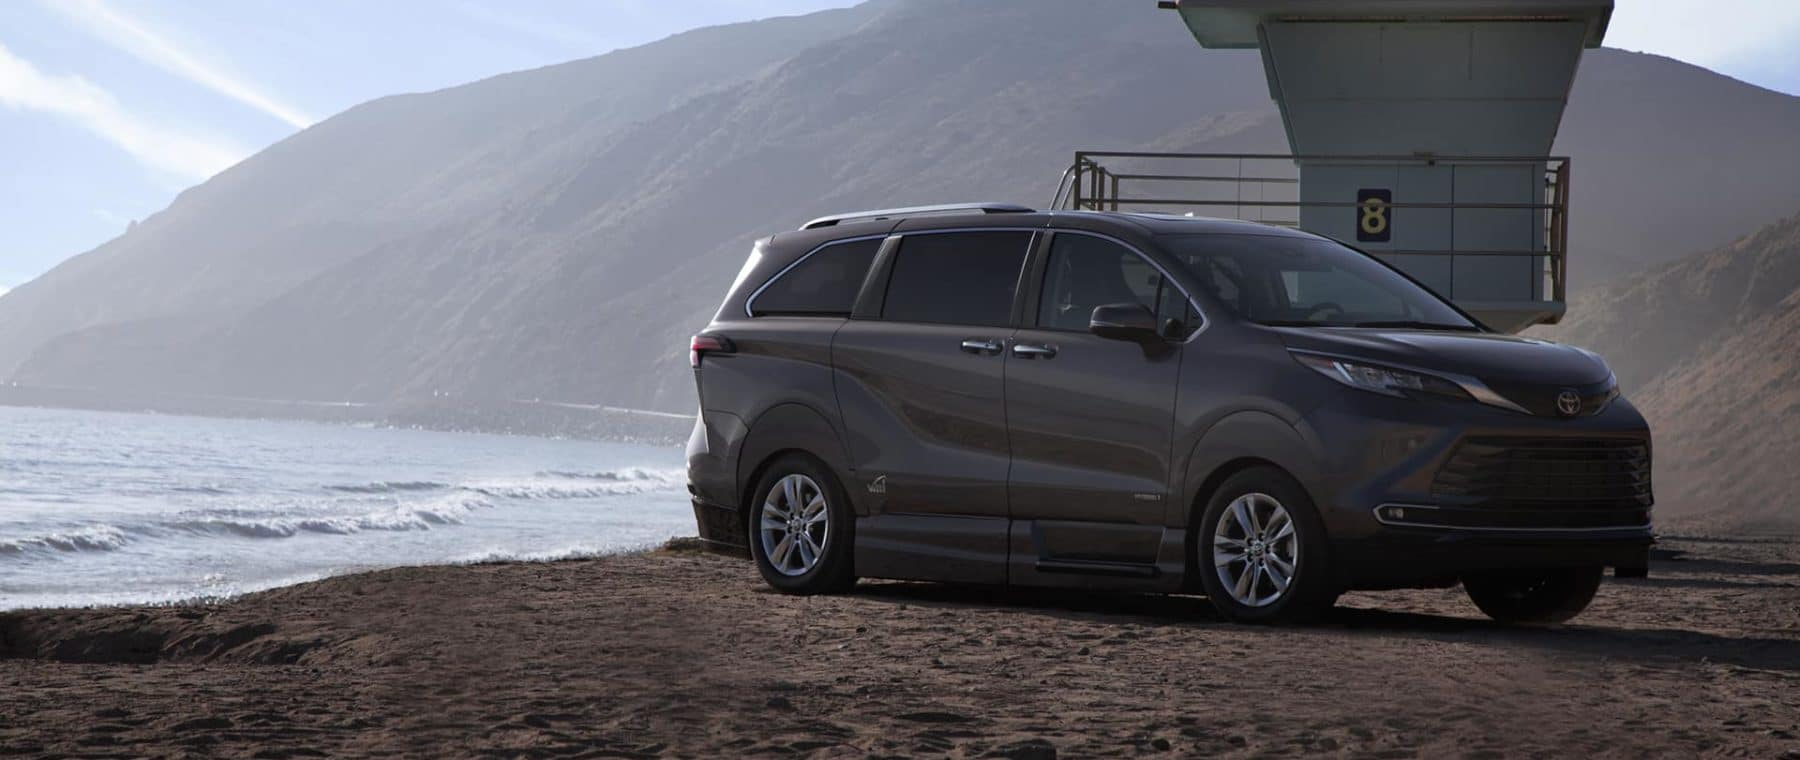 2021-Toyota-Hybrid-AWD-on-Beach